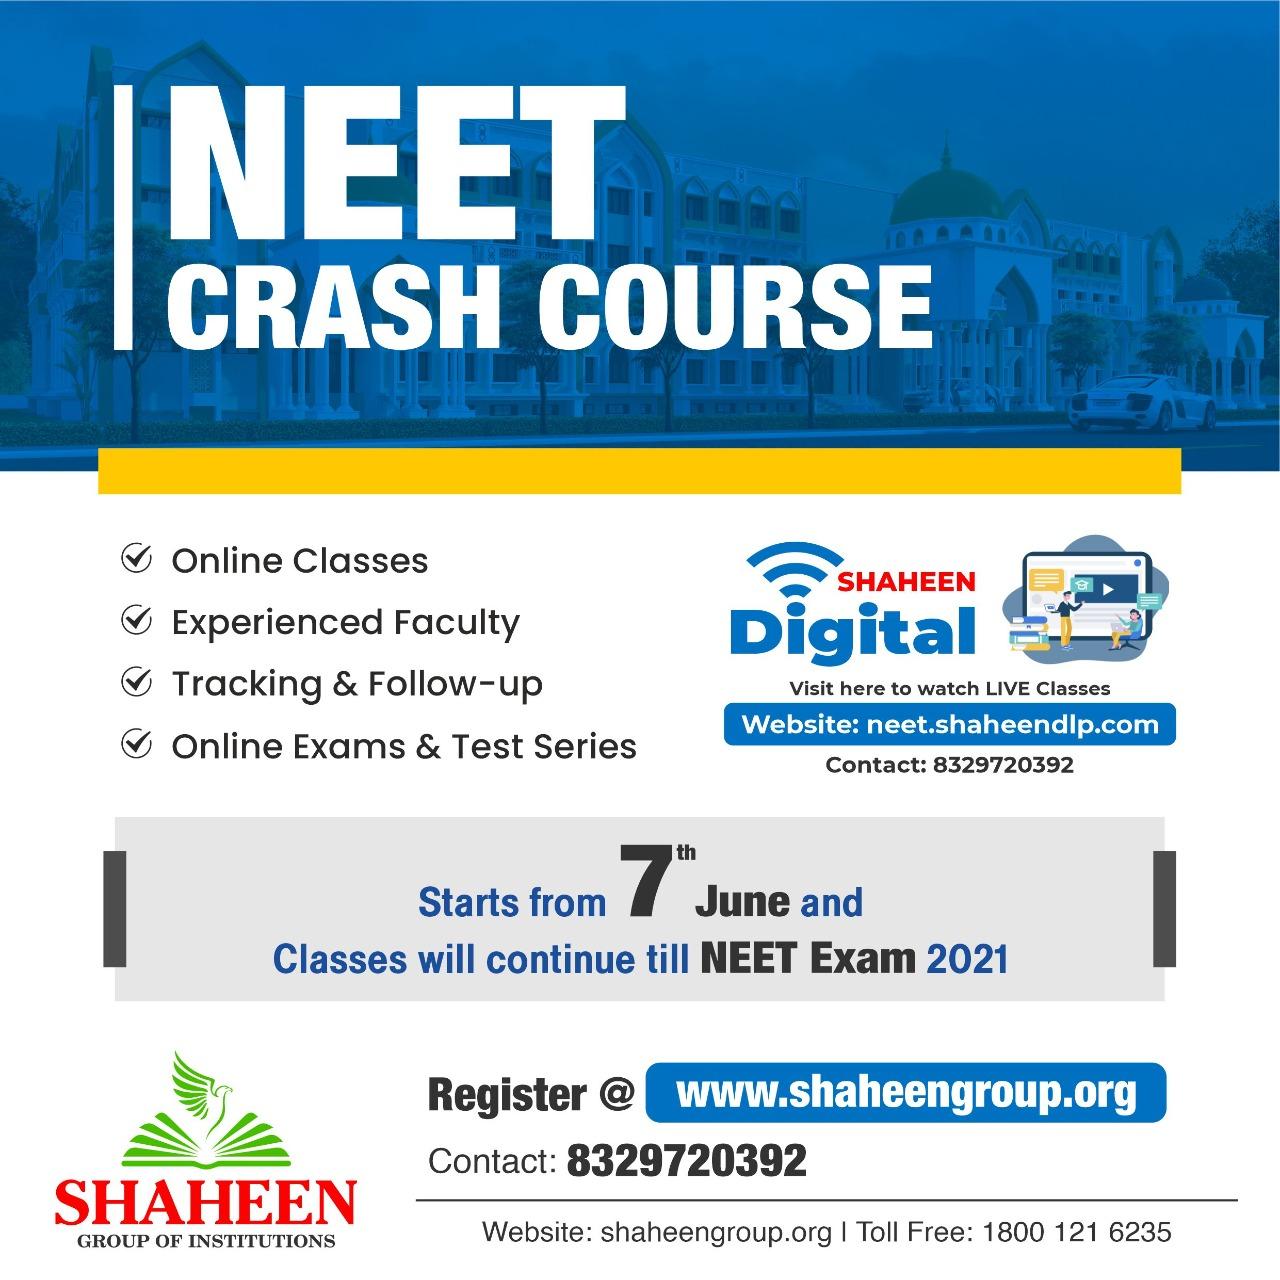 https://shaheengroup.org/wp-content/uploads/2021/06/NEET-CRASH-COURSE Shaheen Online